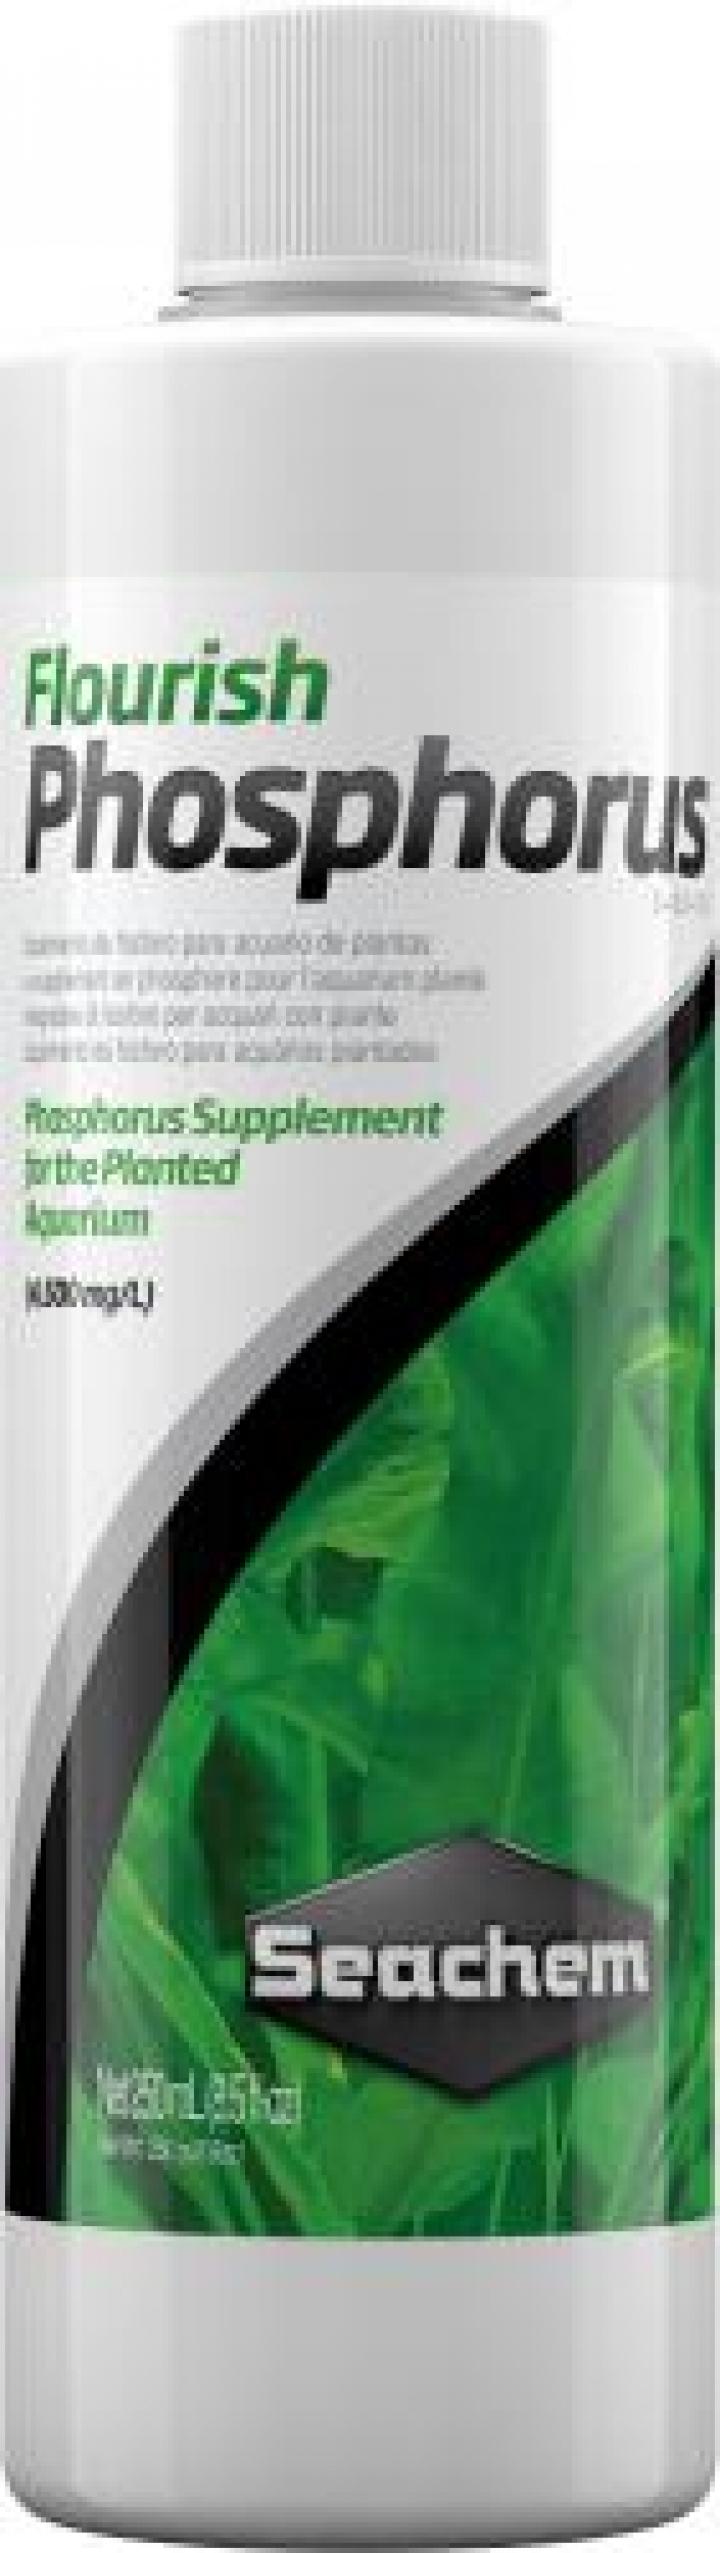 Flourish Phosphorus 500 ml